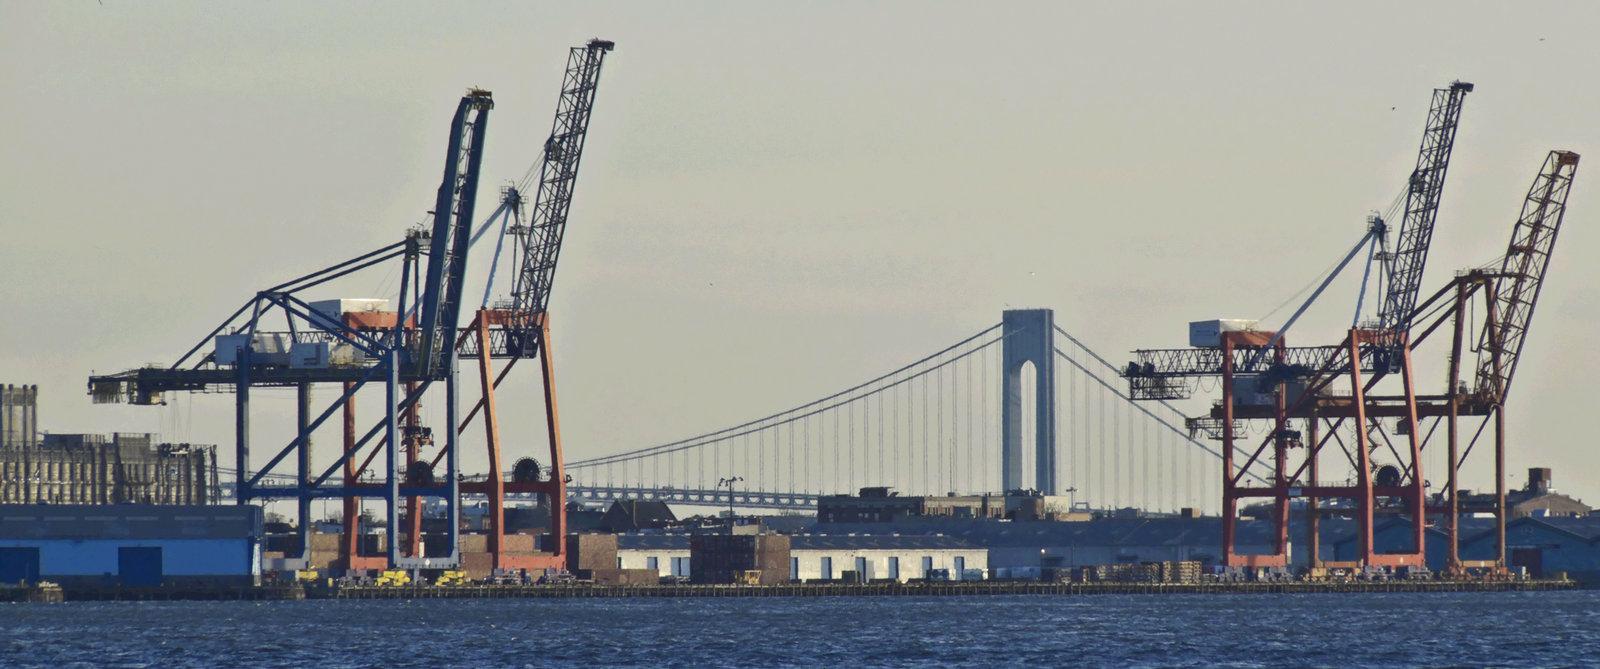 Woodrow Staten Island, NY Private Investigator